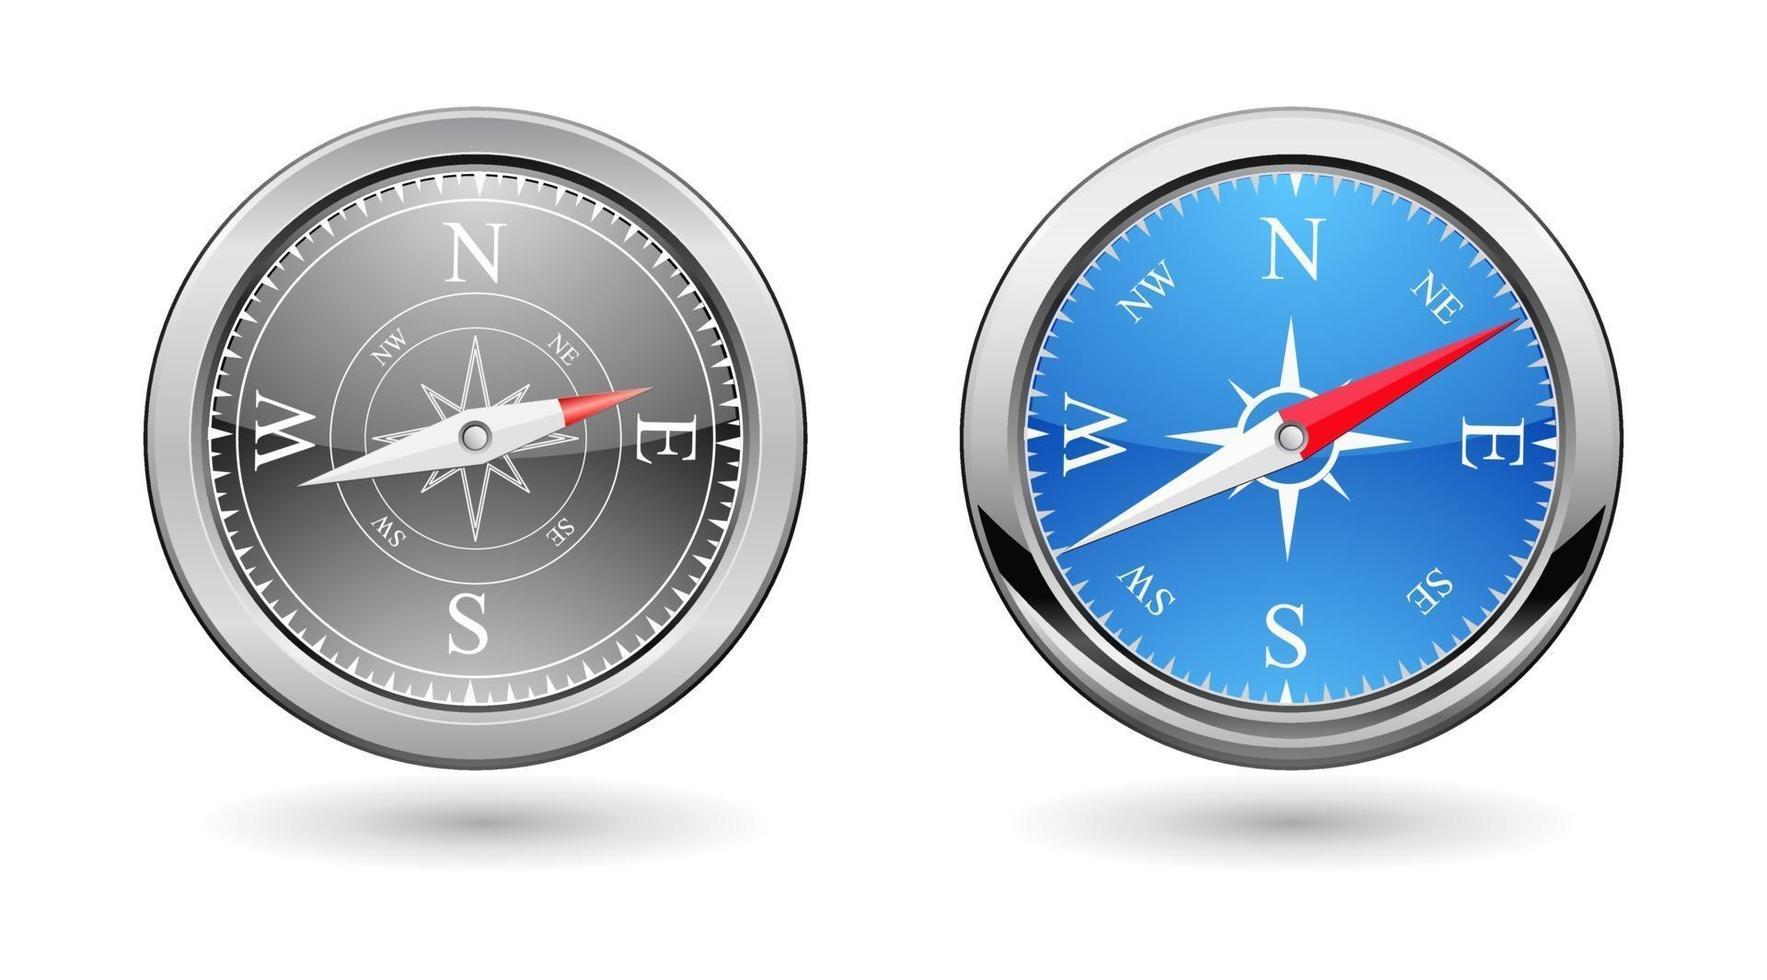 Kompass Metall Symbol vektor